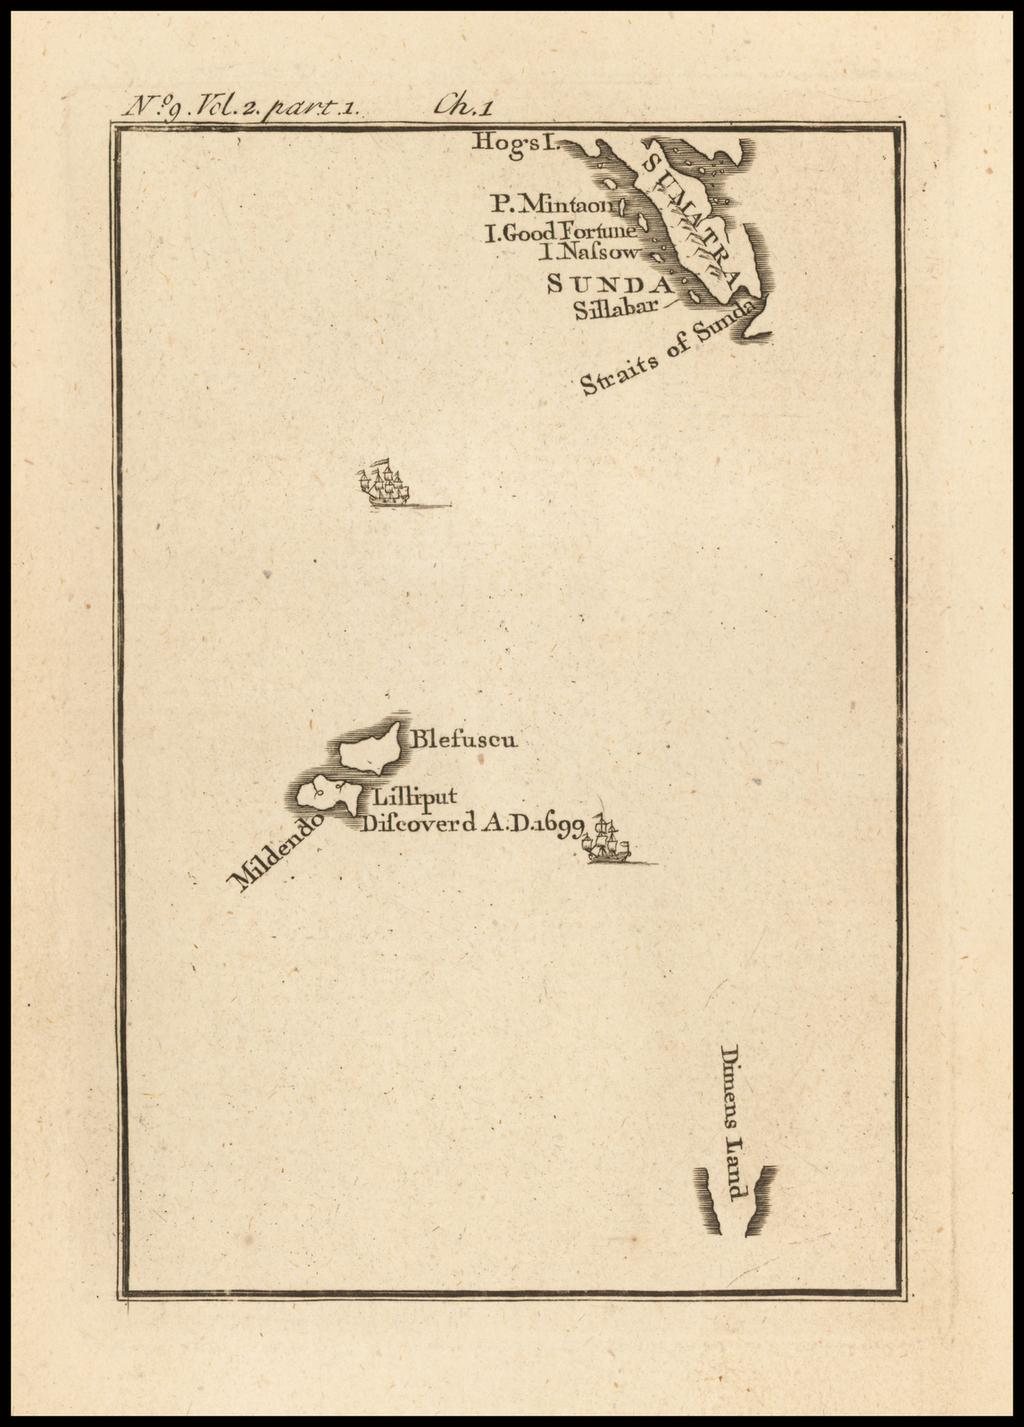 [Sunda and Lilliput, etc. from Gulliver's Travels] By Jonathan Swift